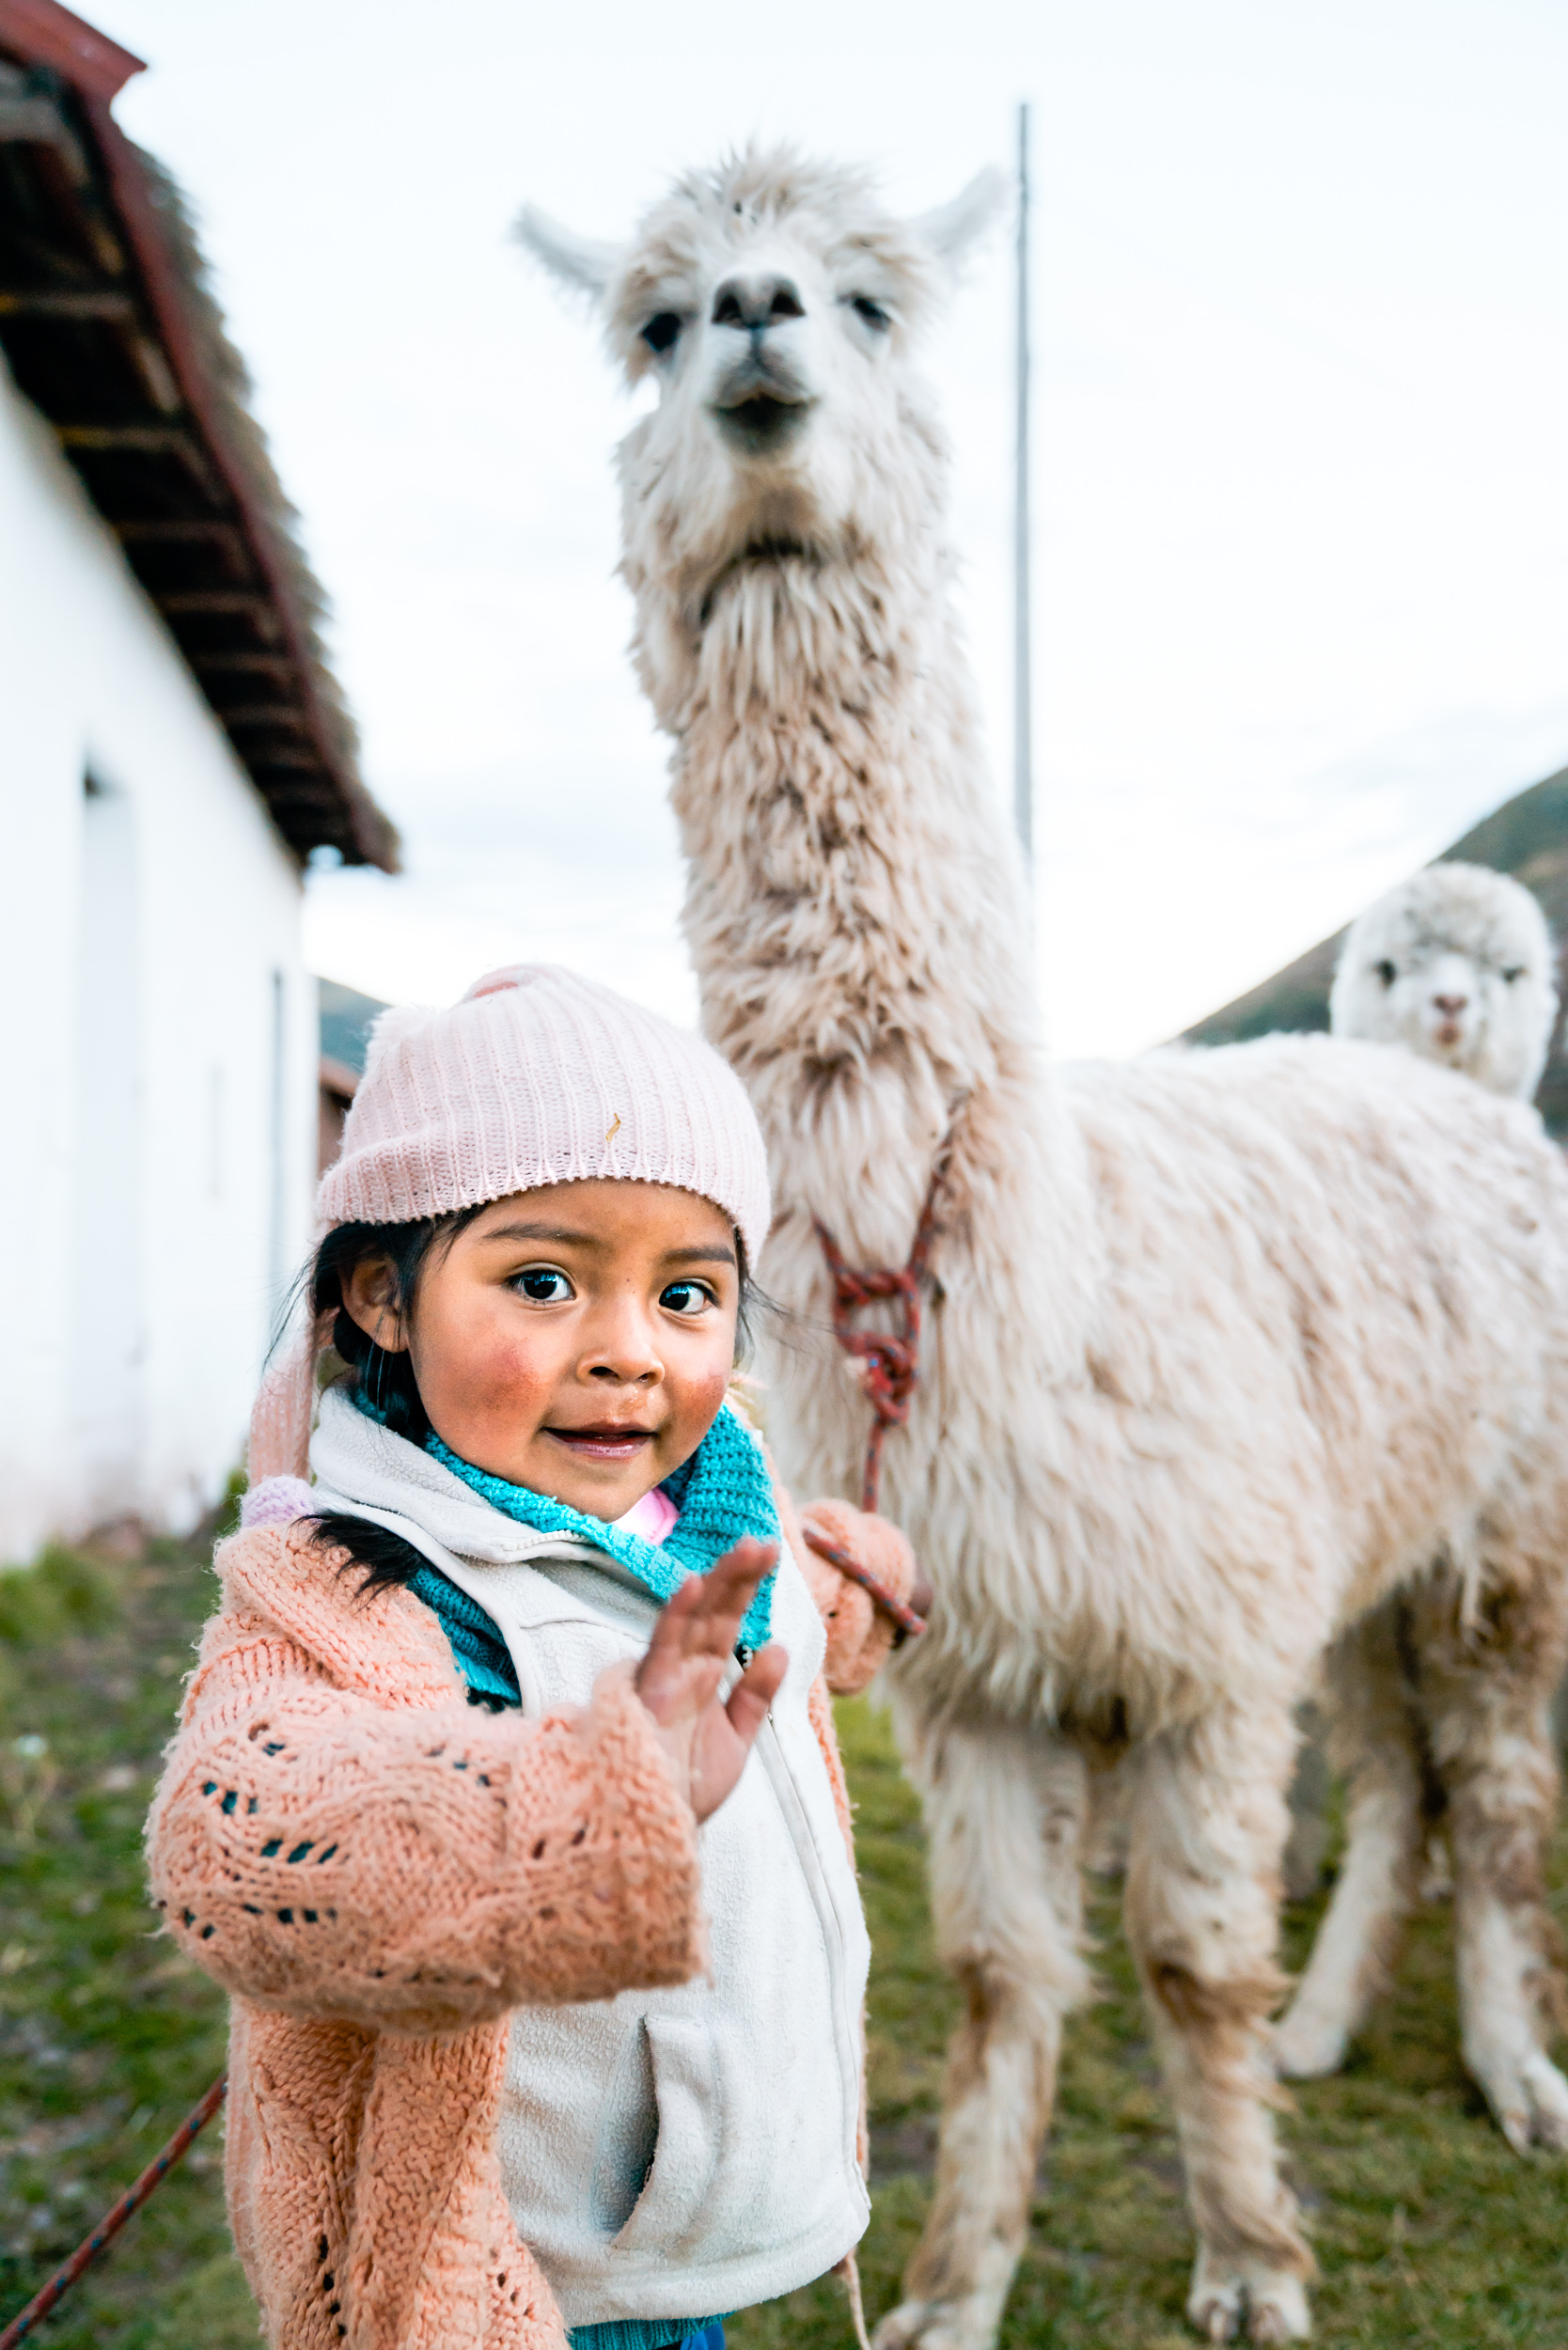 Helping Hand - Huancalli, Peru